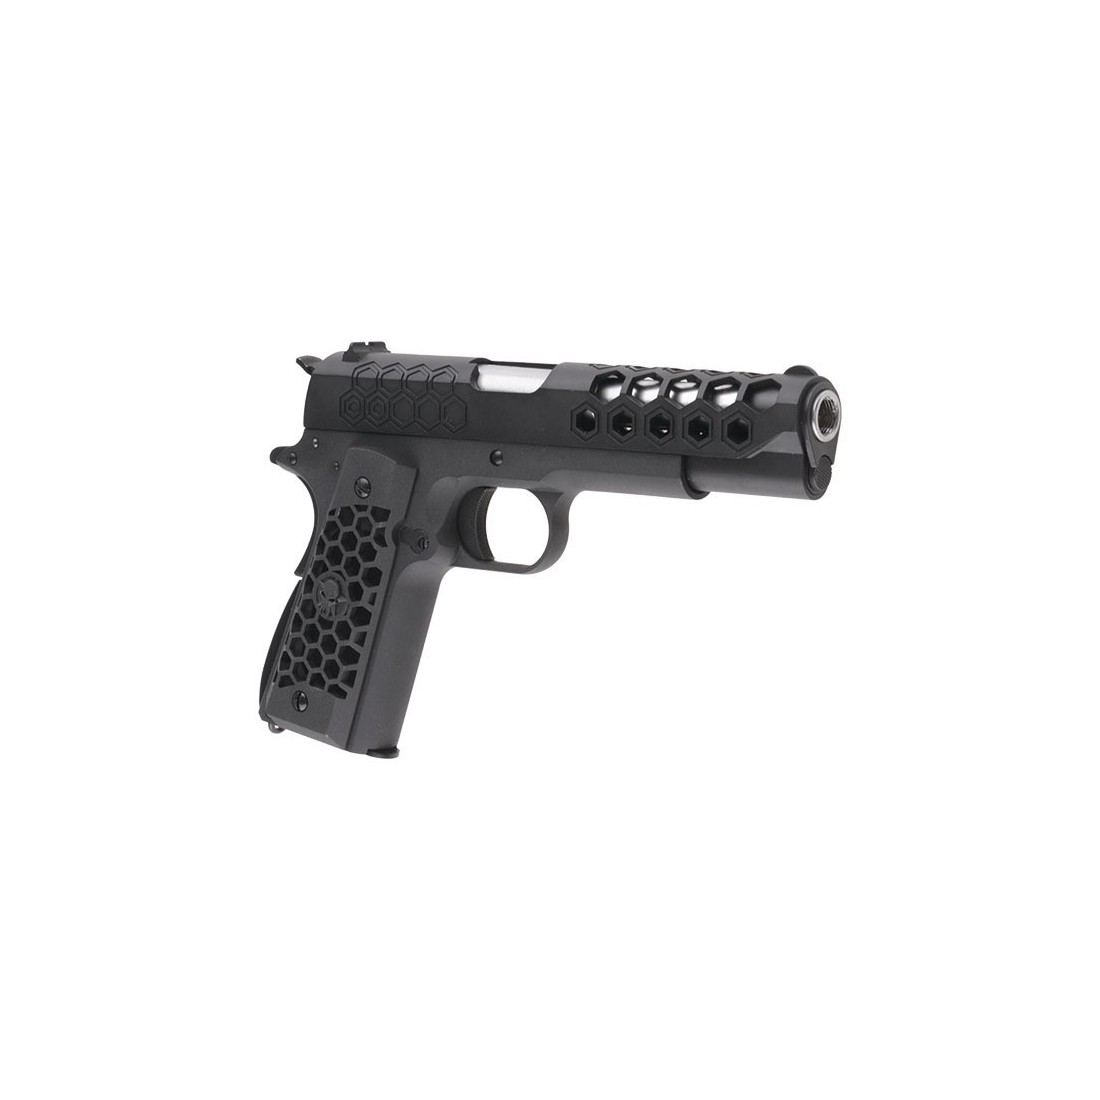 Pistola 1911 Hex Cut V3 bk [WE]